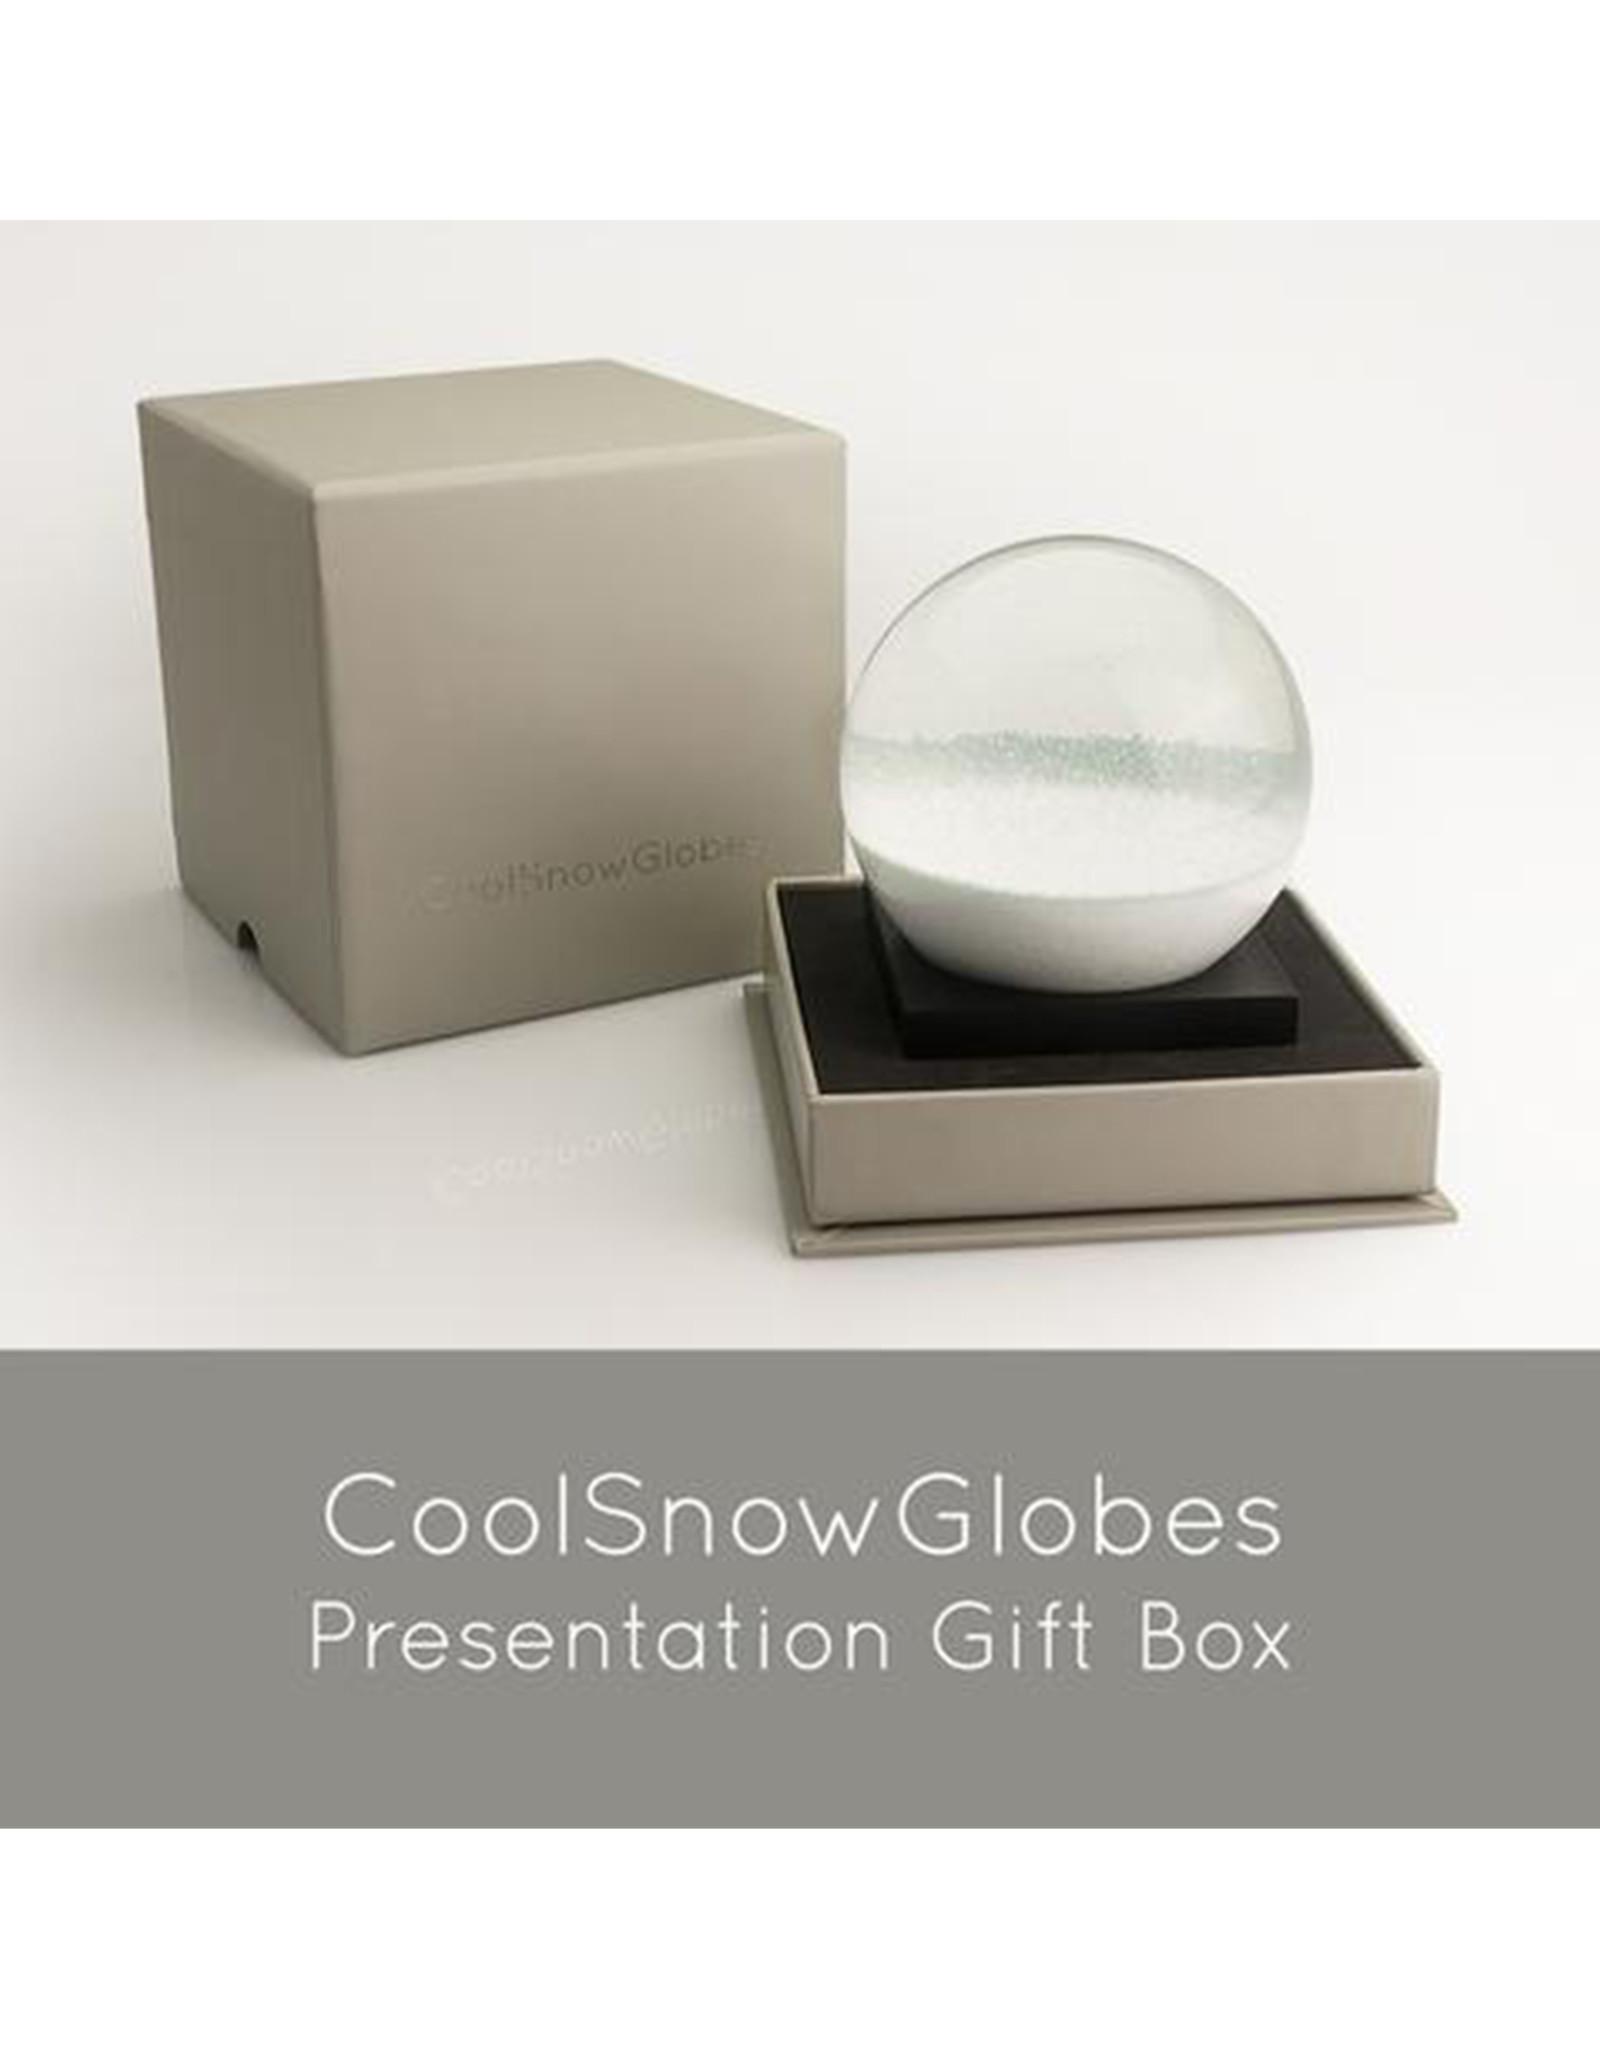 COOL SNOW GLOBES SPRING SNOW GLOBE